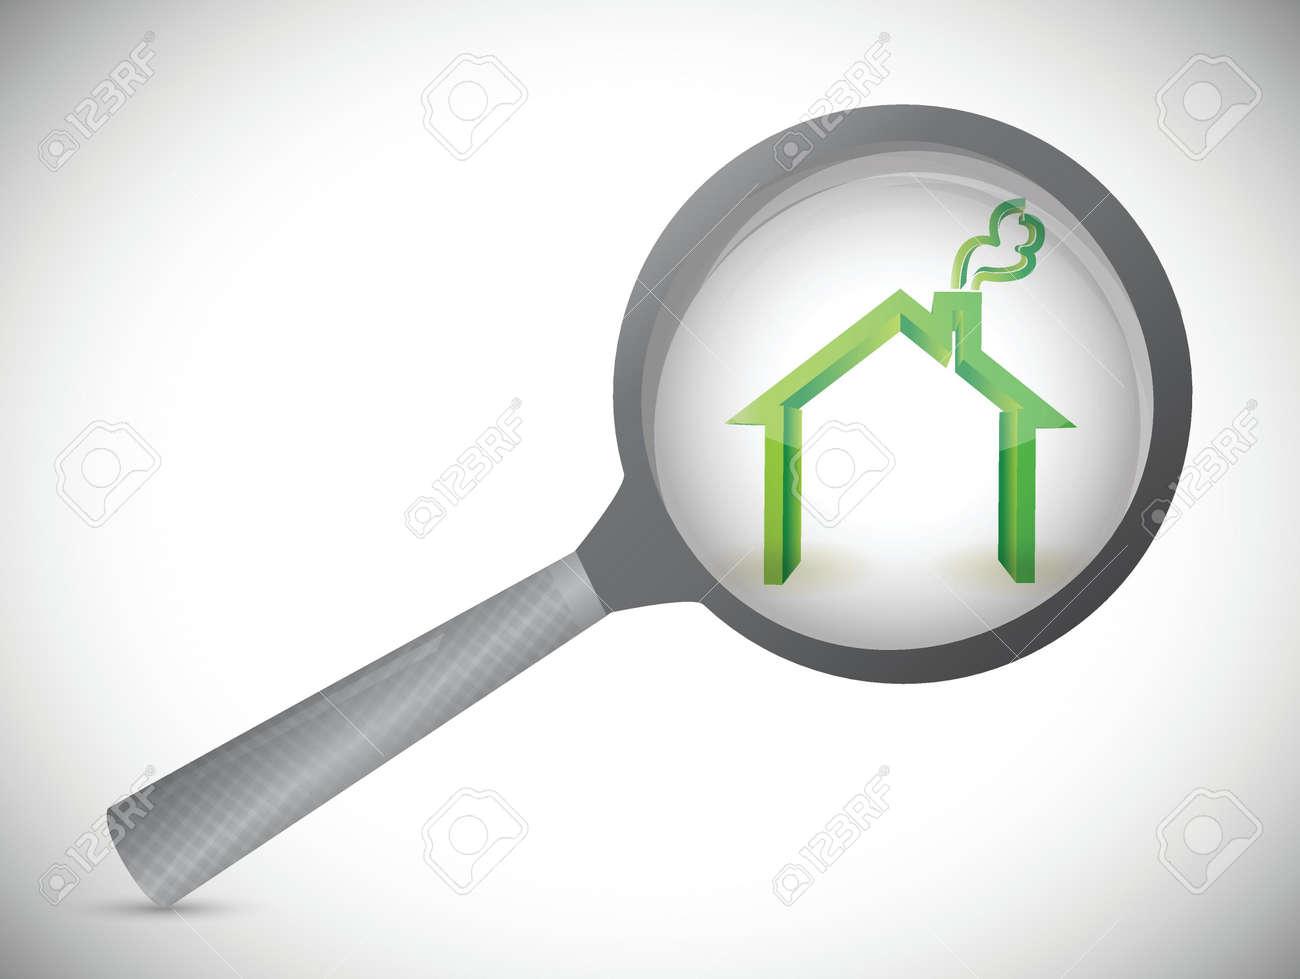 house inspection illustration design over a white background Stock Vector - 21314071